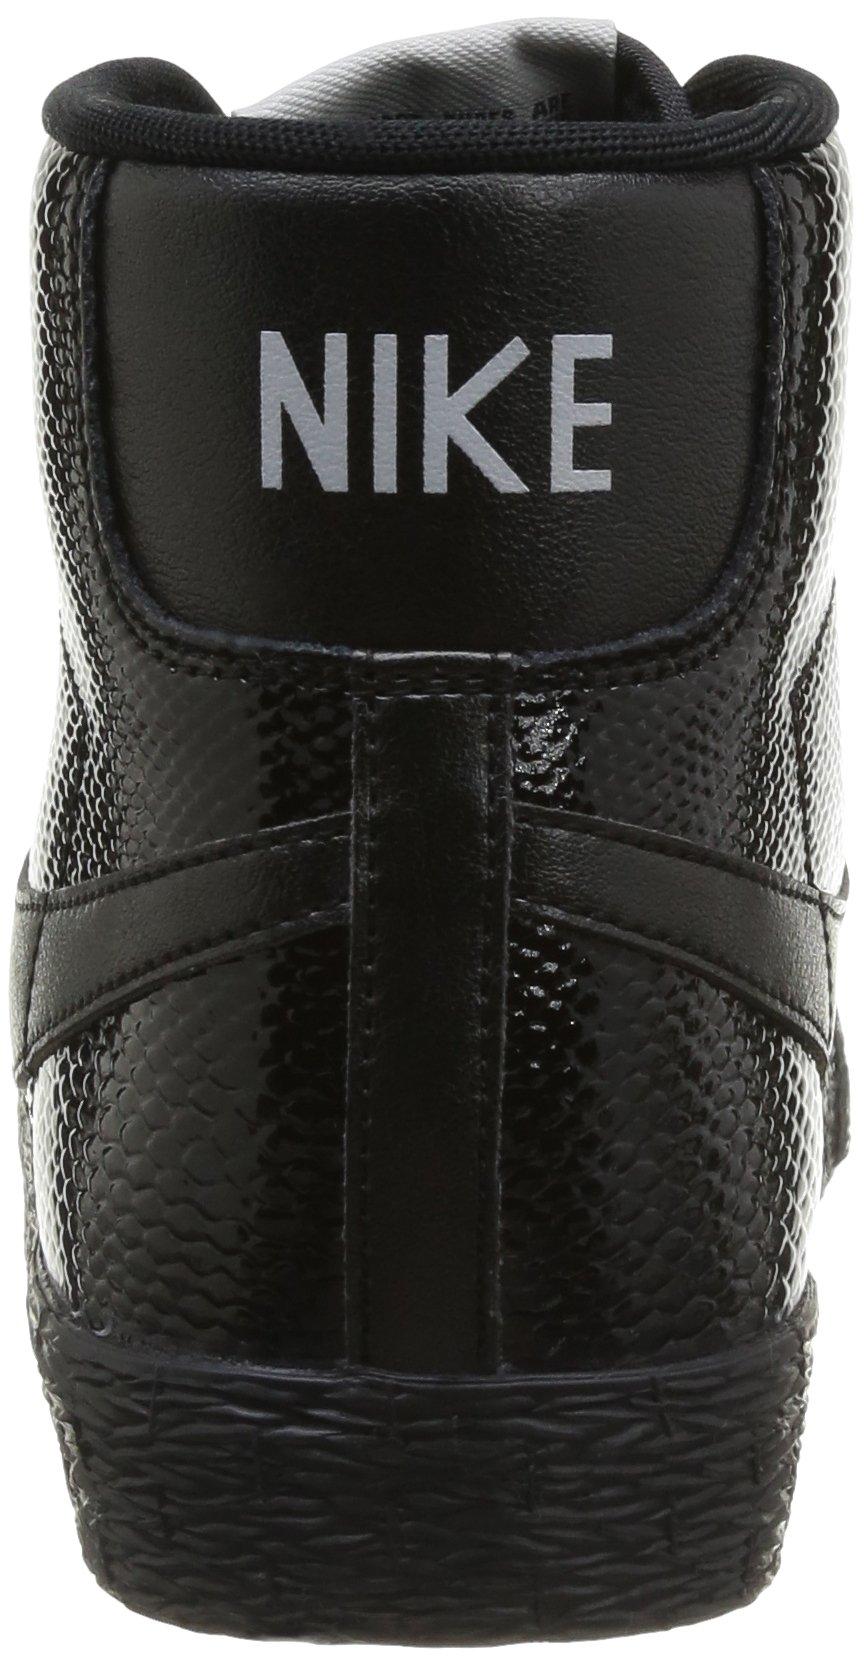 Nike Women's Blazer MID LTR PRM Black 685225-001 (SIZE: 8) by NIKE (Image #2)